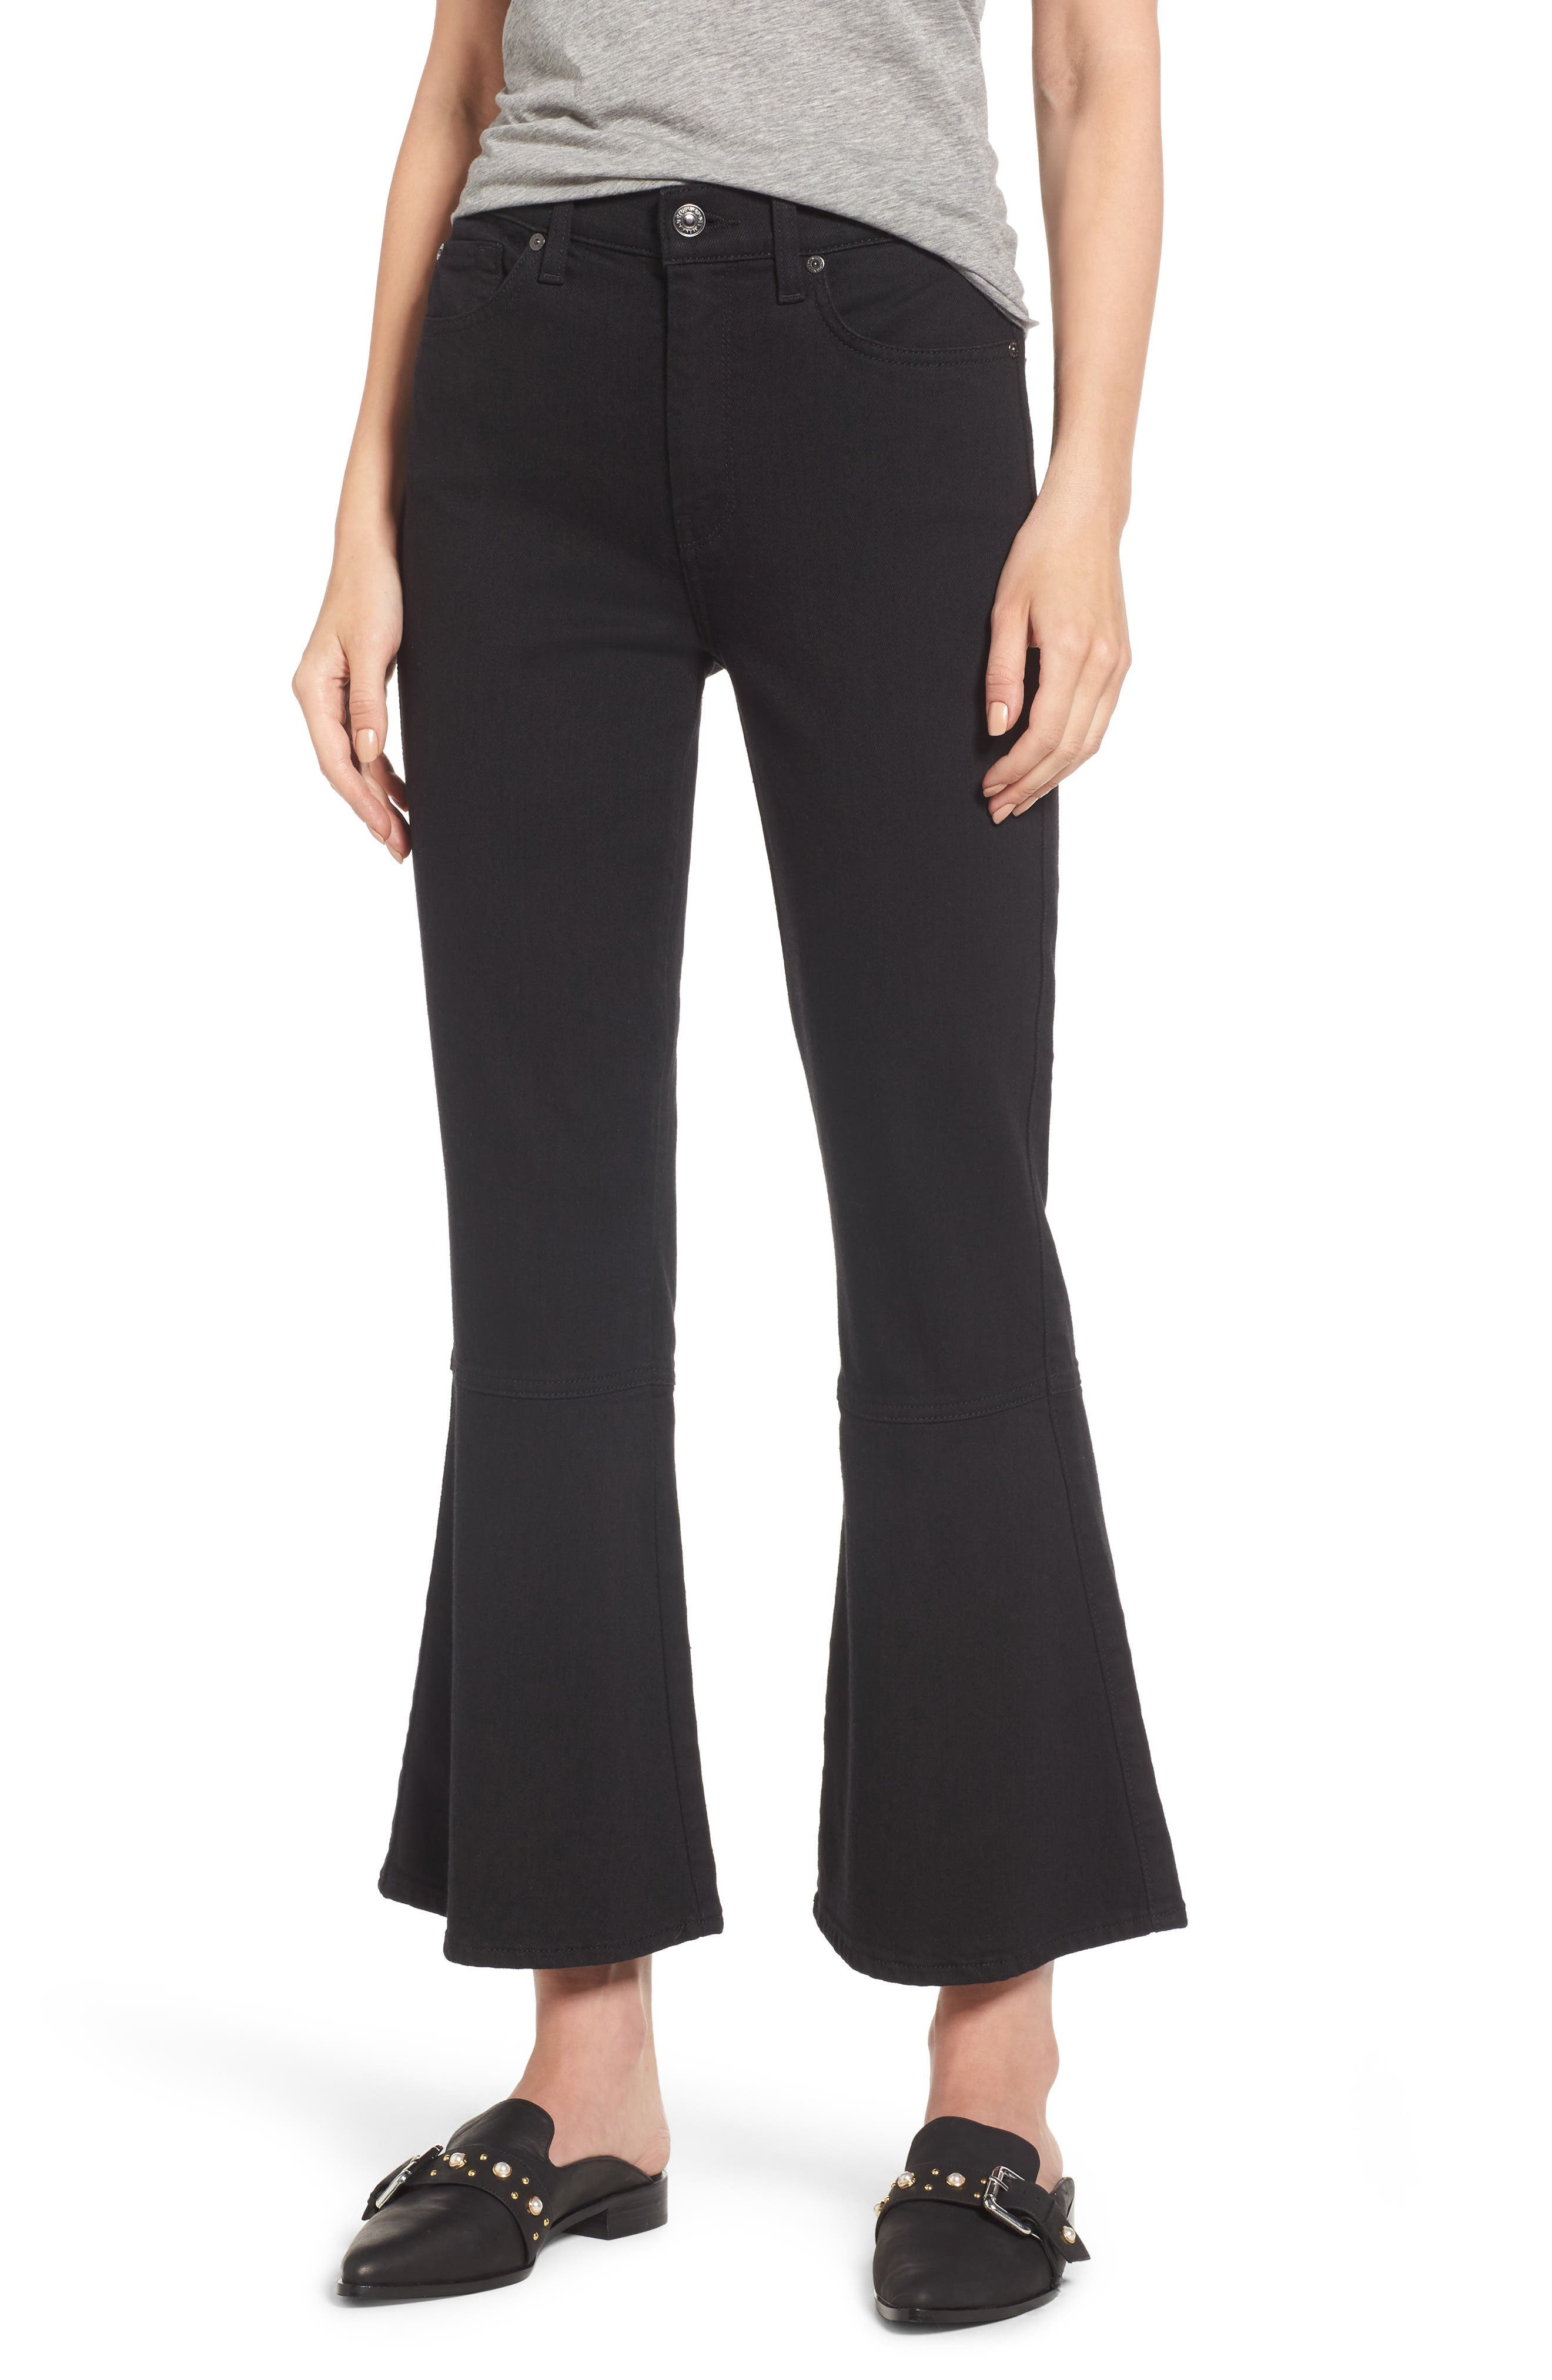 Priscilla High Waist Crop Flare Jeans,                             Main thumbnail 1, color,                             Night Black